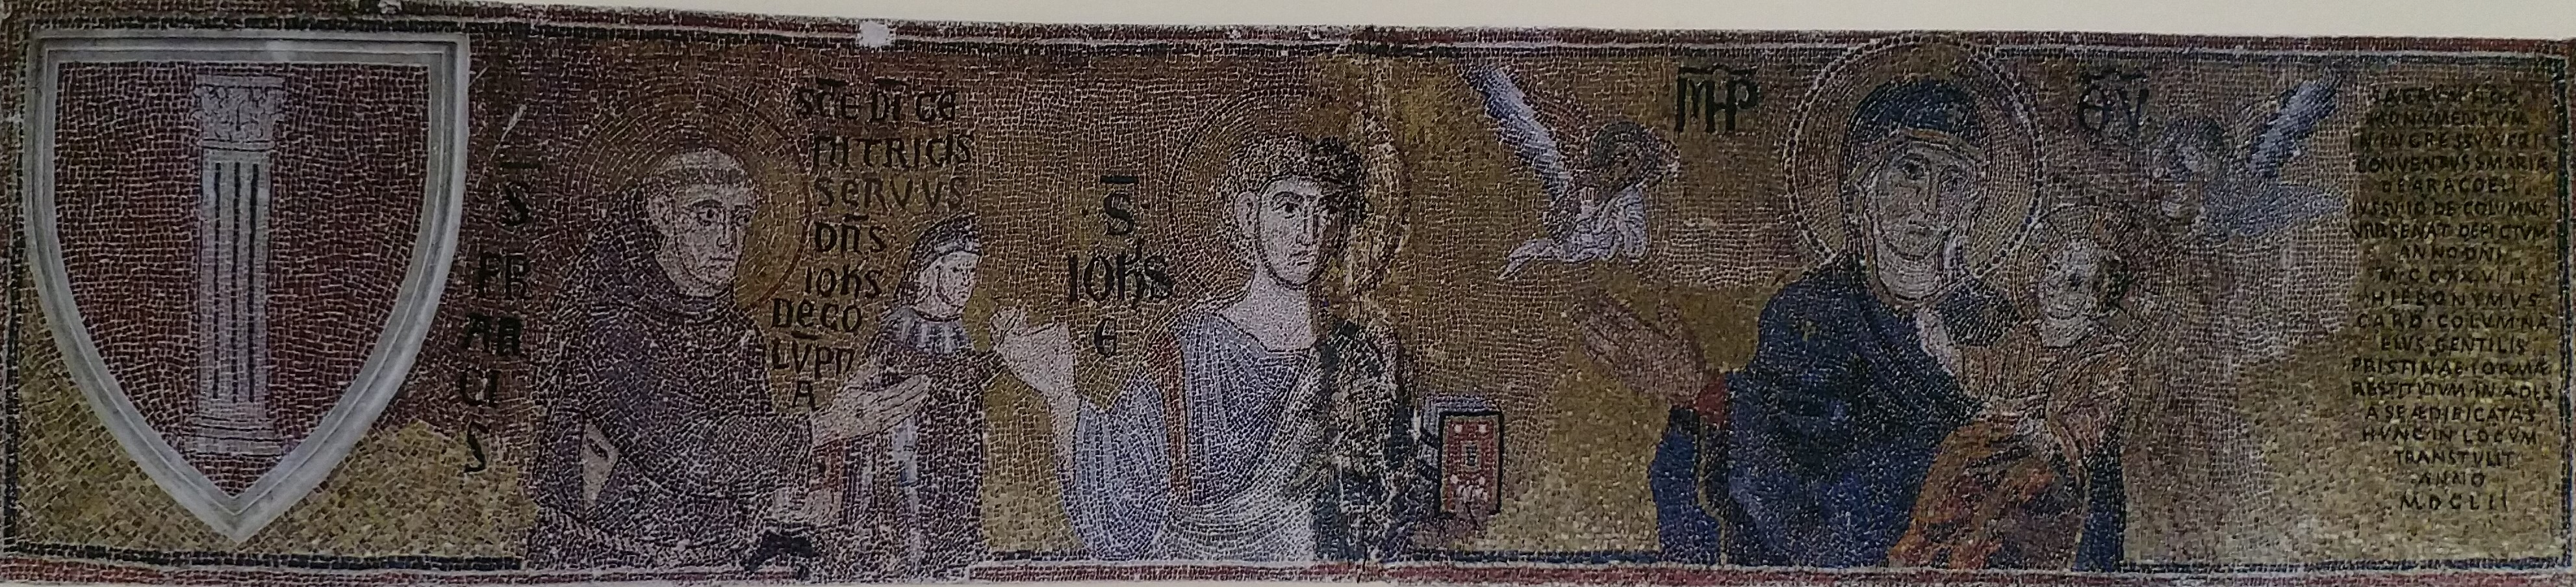 Mosaique provenant de Santa Maria in Aracoeli, chapelle du Palazzo Colonna